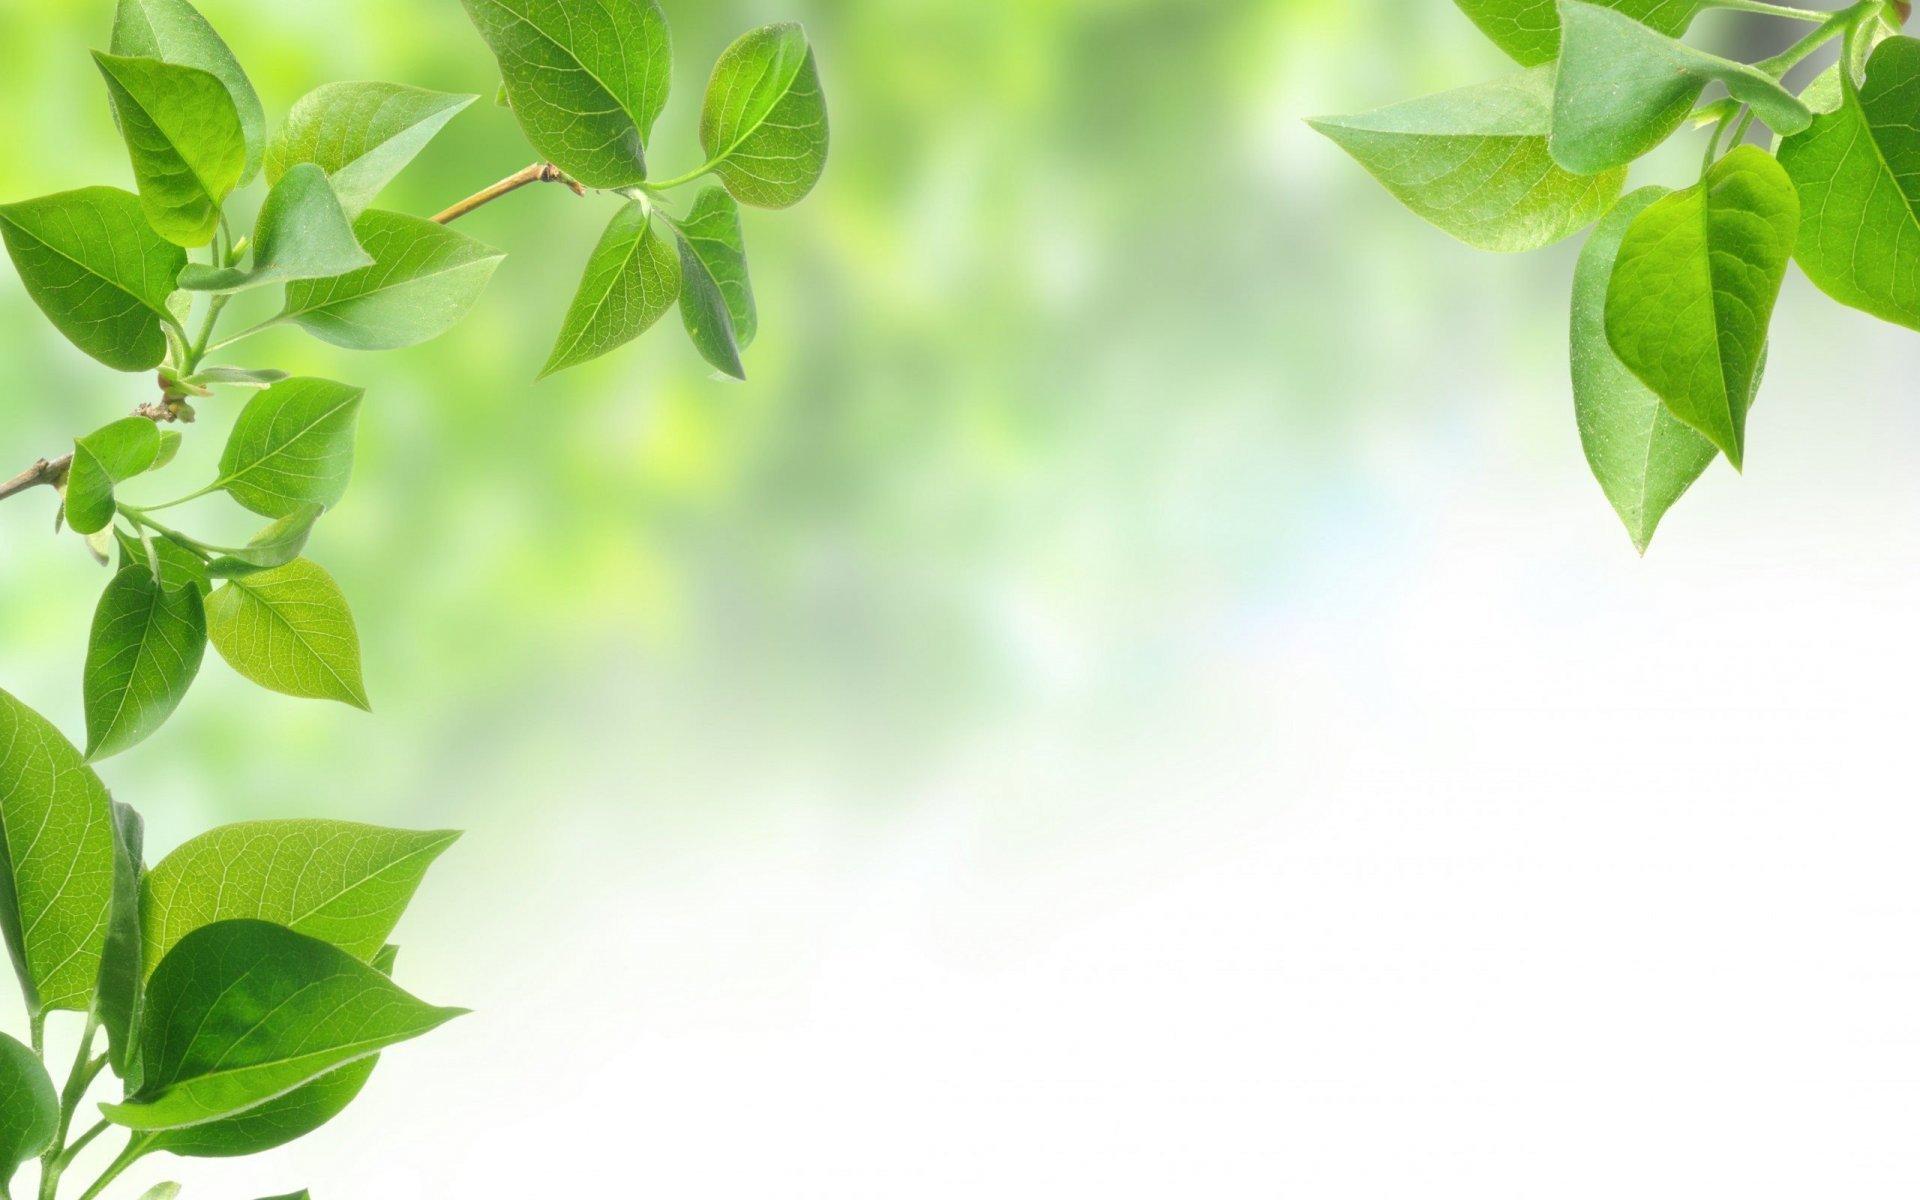 Free Photo Green Leaves Background Green Light Leaf